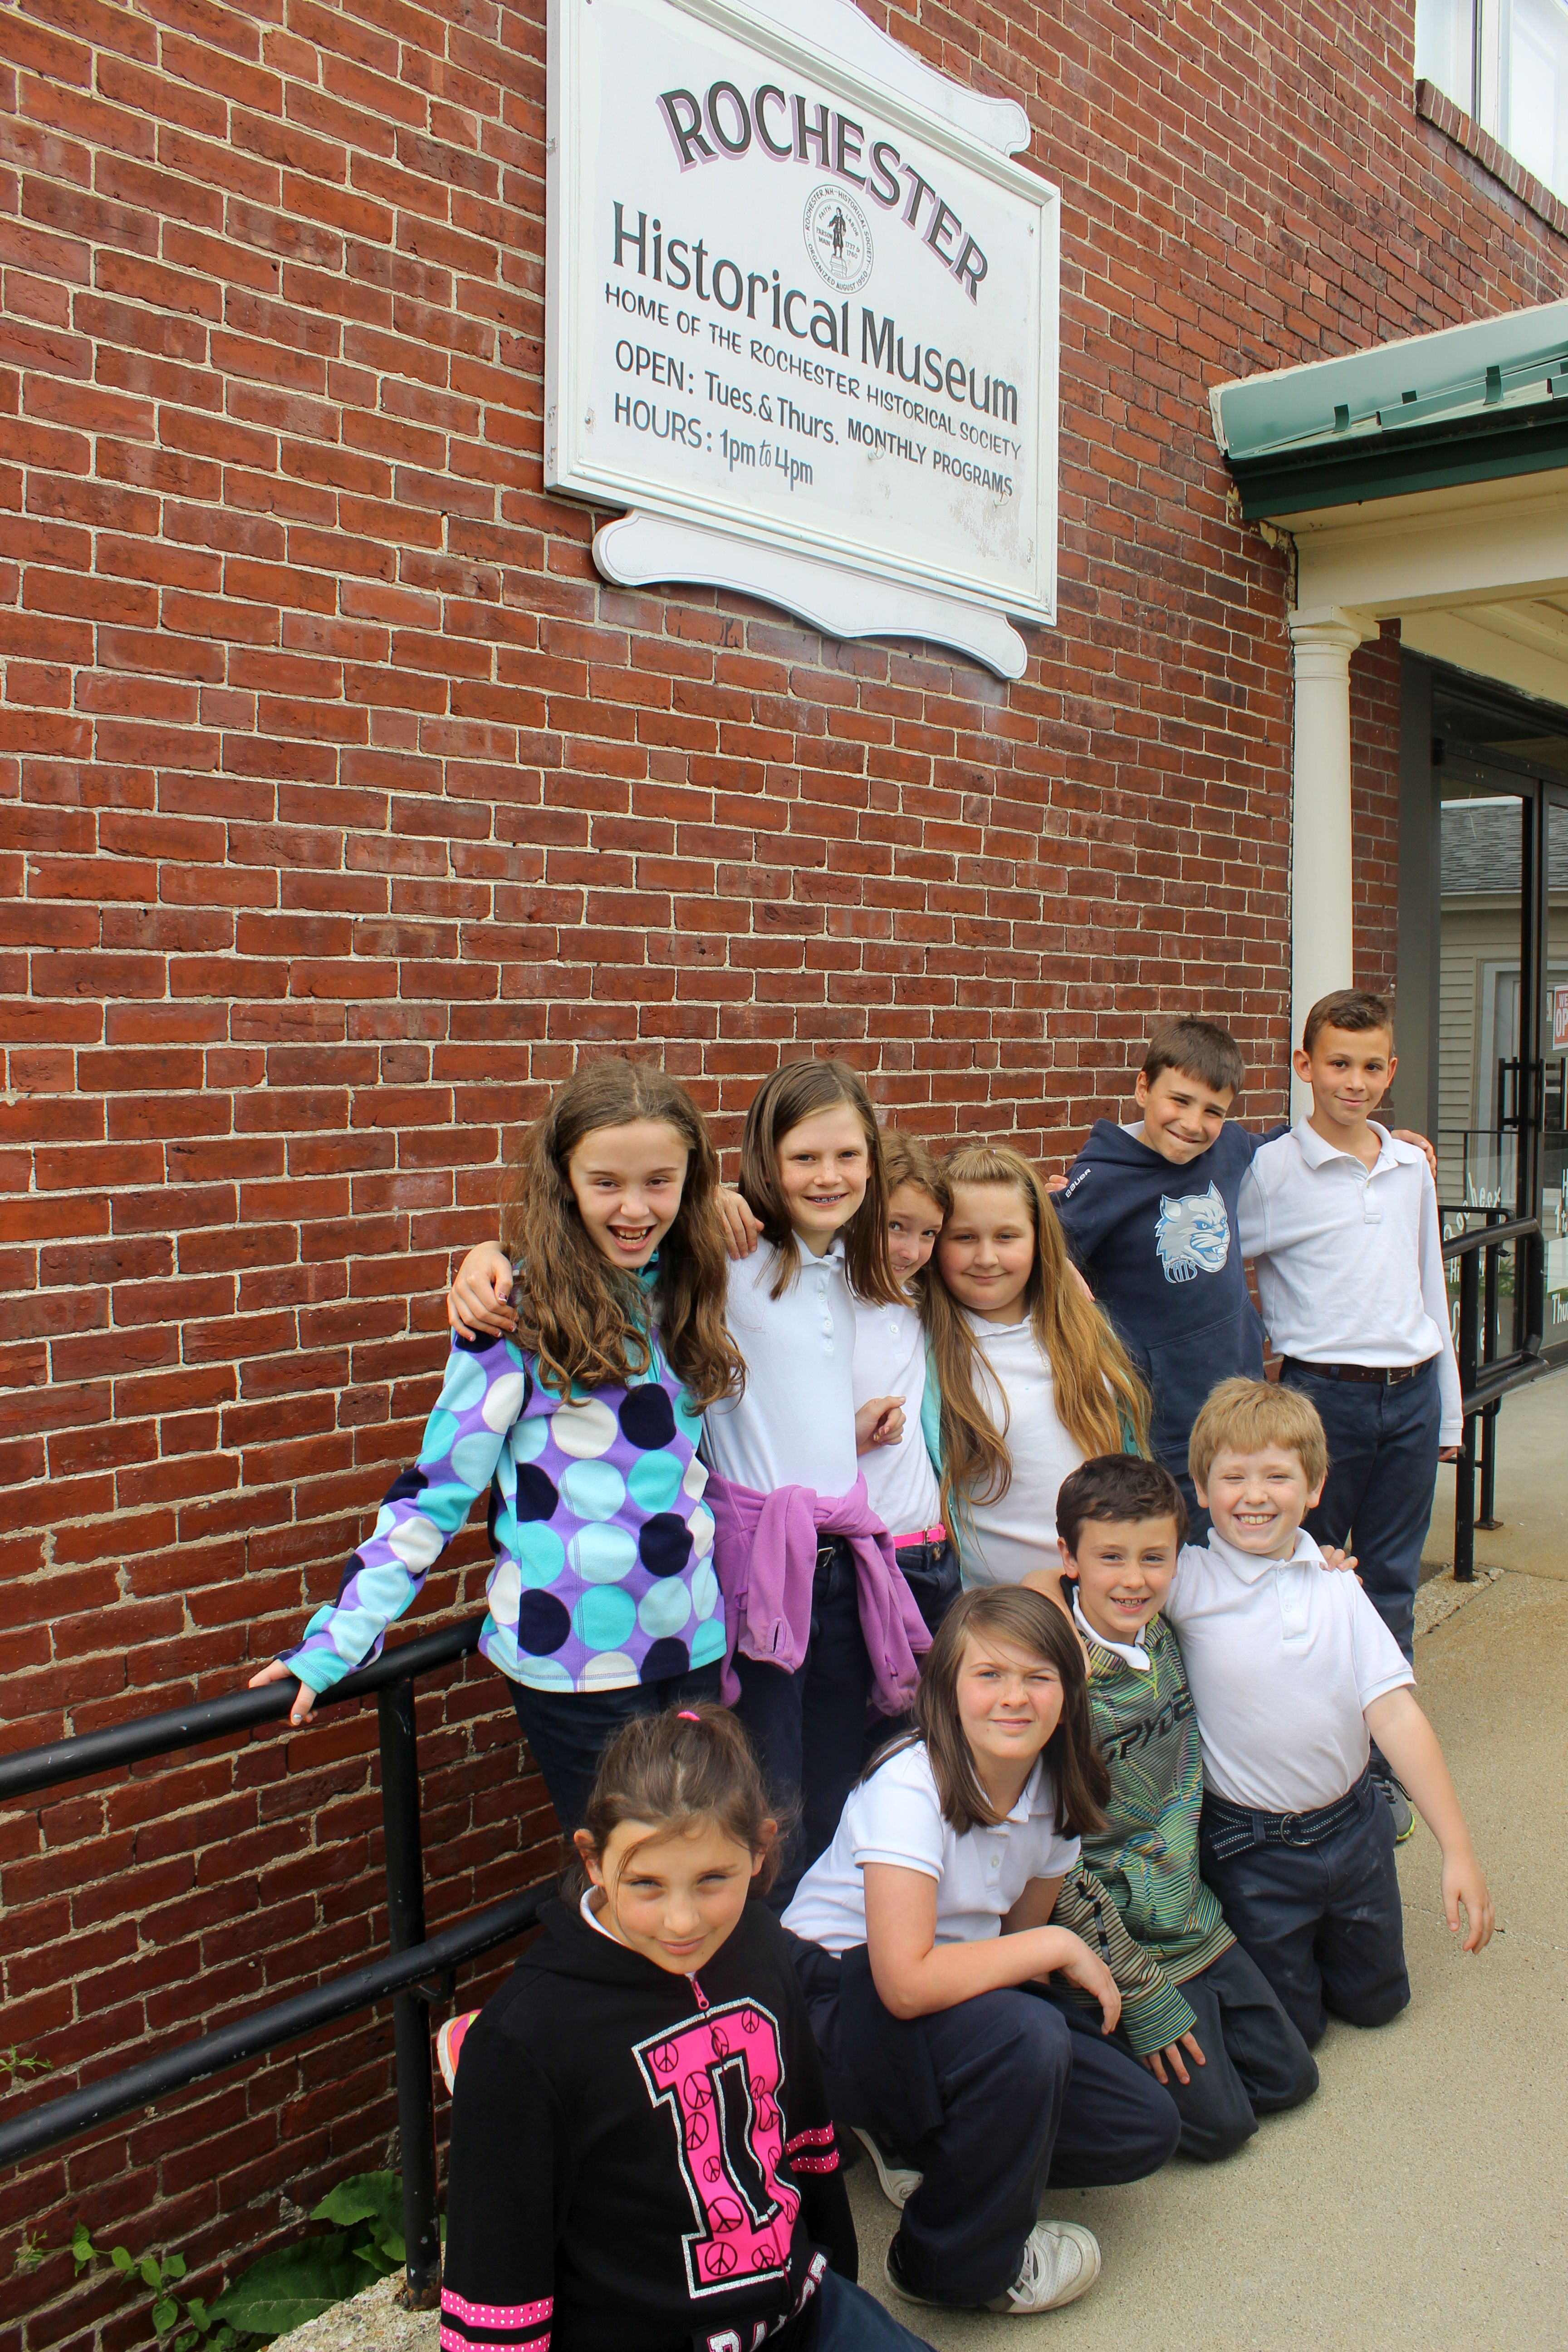 Rochester Historical Society